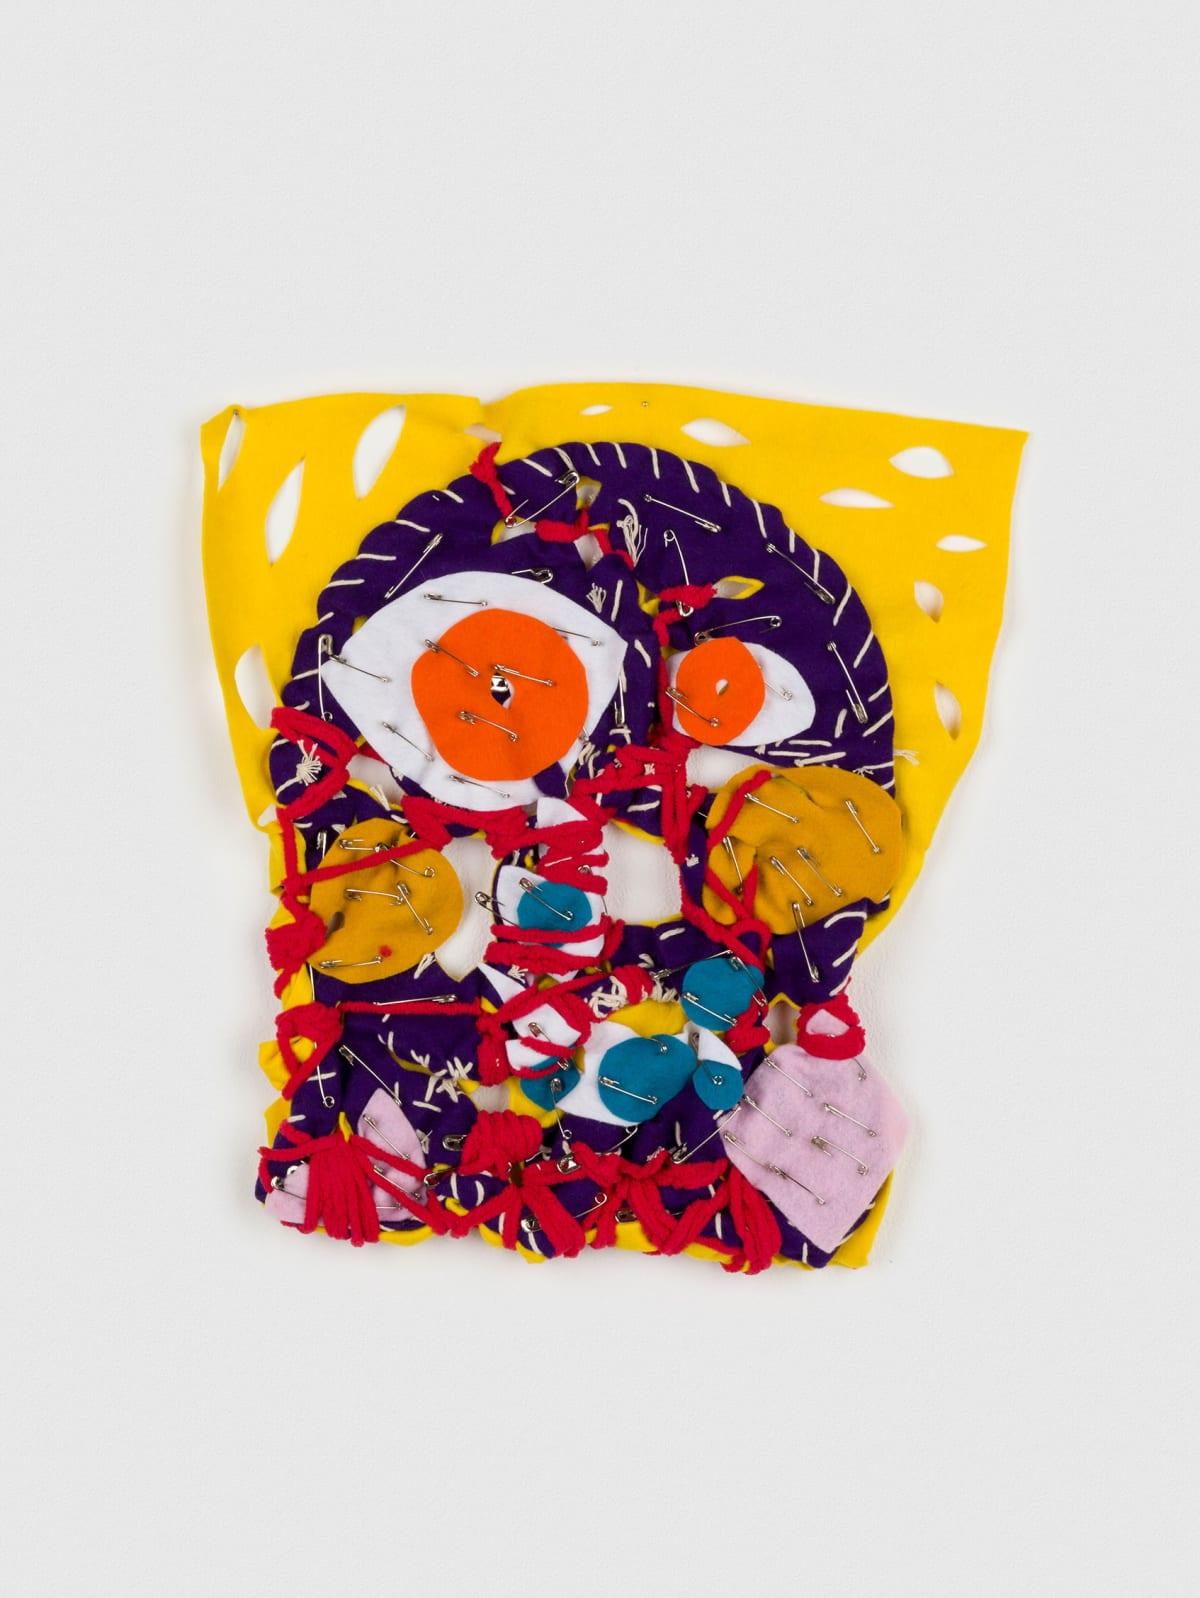 hans gallery, nada chicago,  gallery open, new art dealers alliance